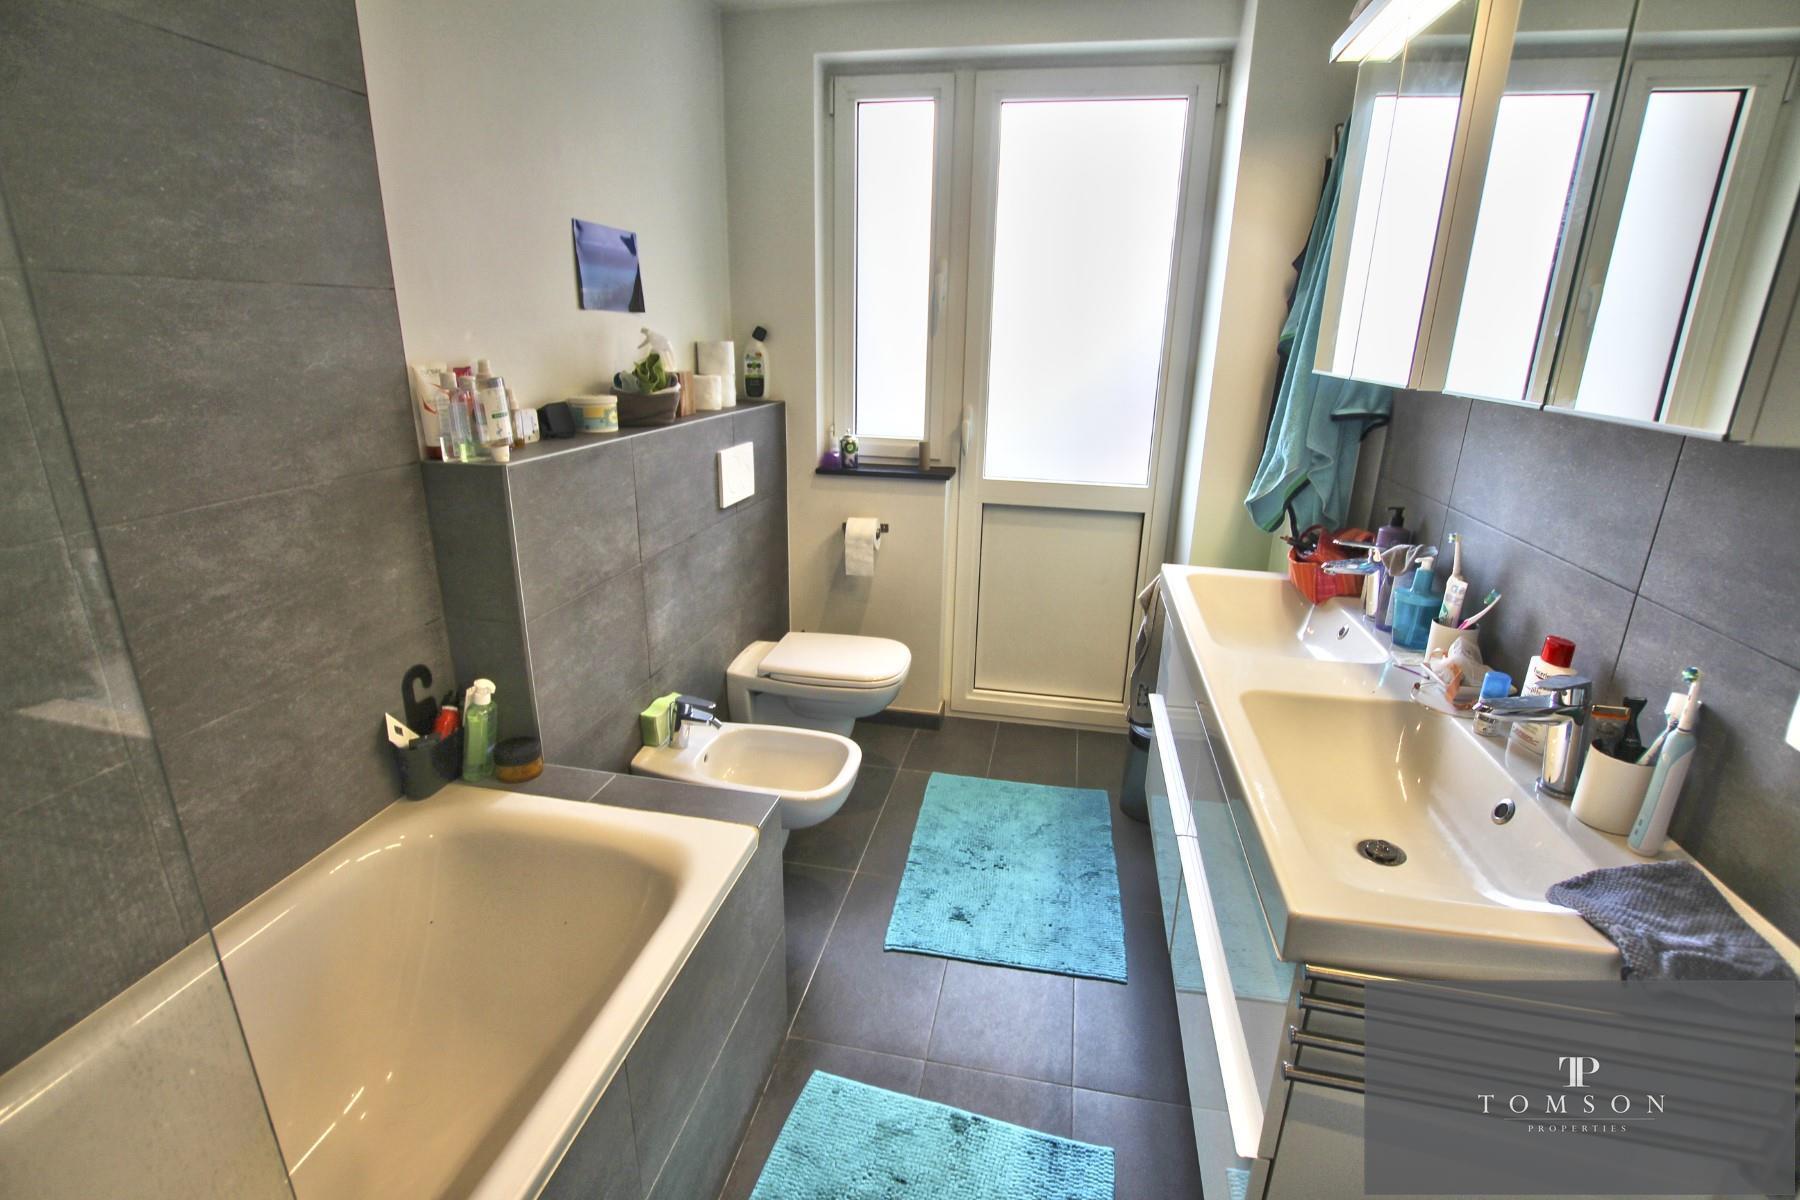 Appartement exceptionnel - Woluwe-Saint-Pierre - #4324789-8